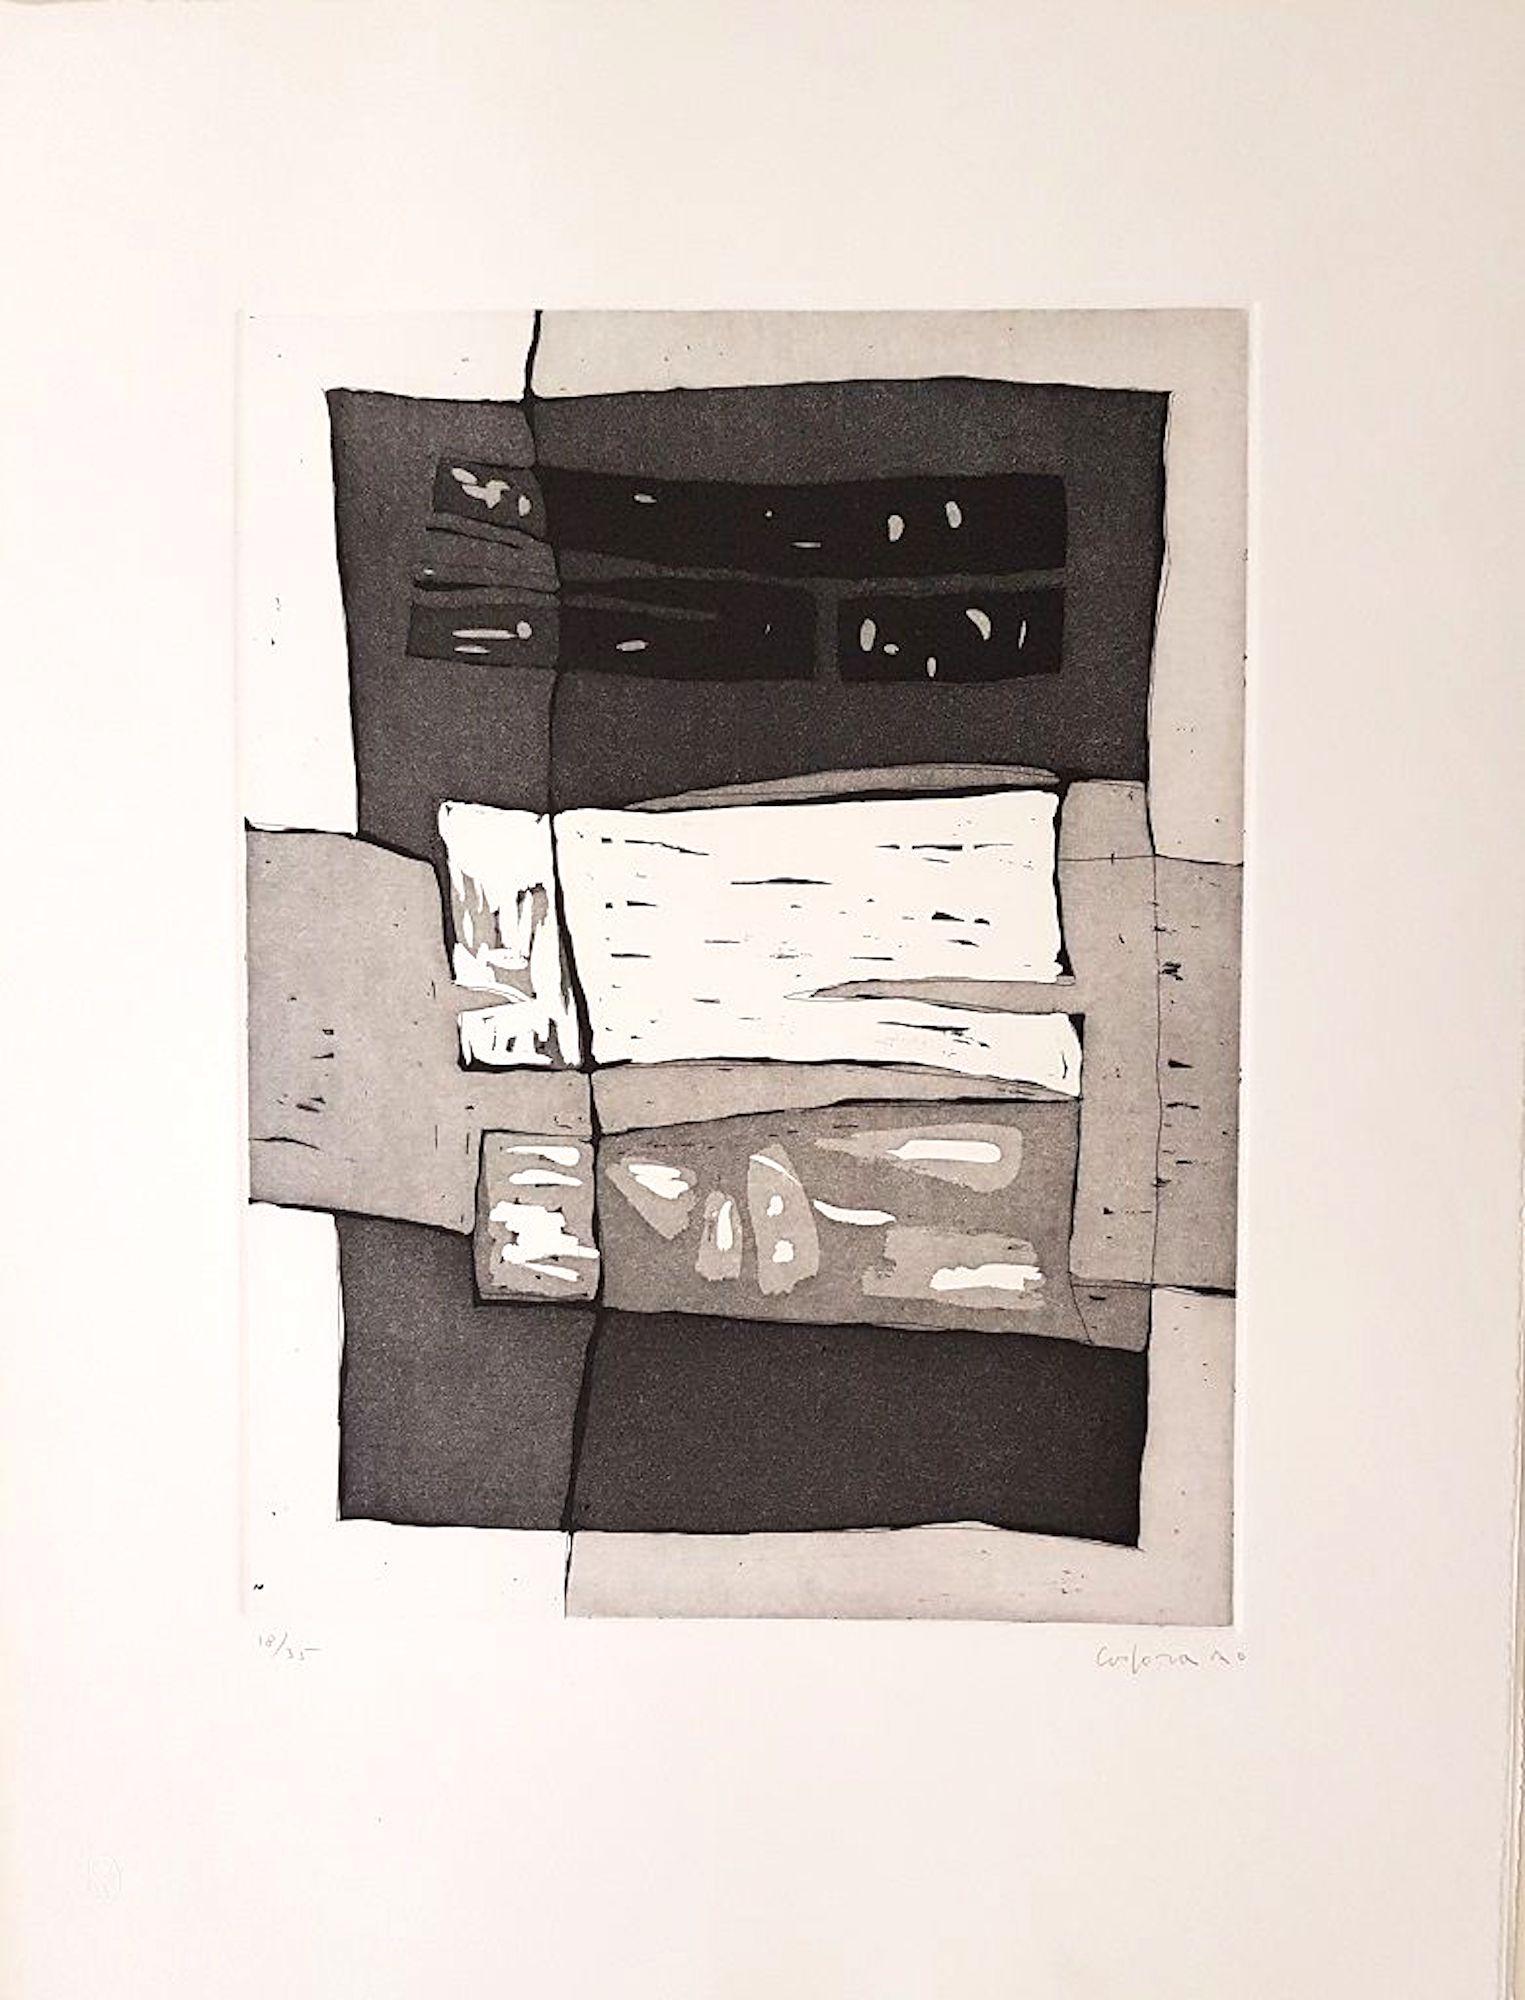 Untitled - Antonio Corpora - 1970s - Etching - Contemporary